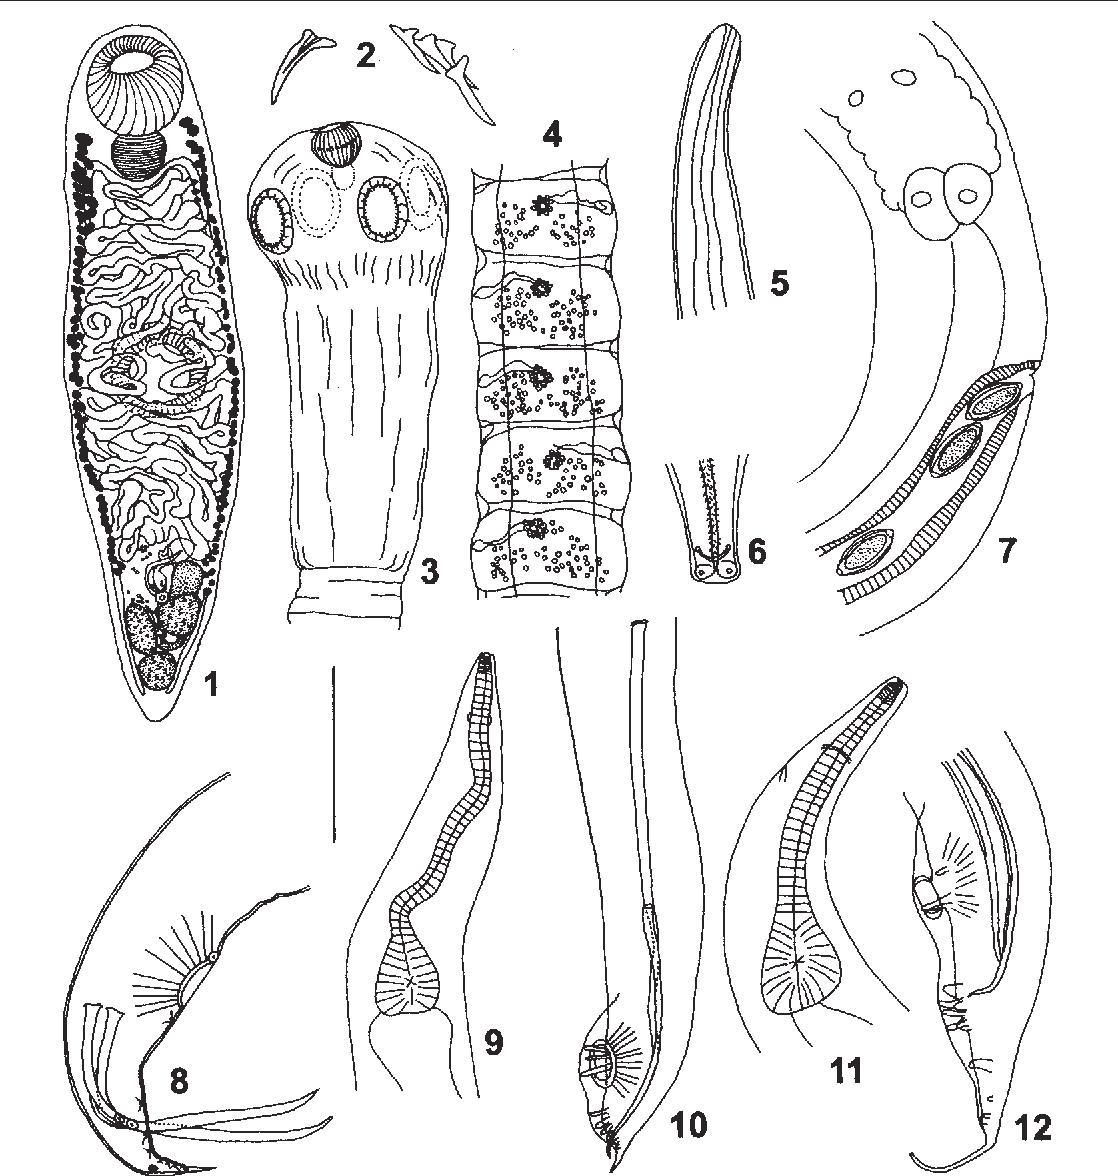 figure 1-12